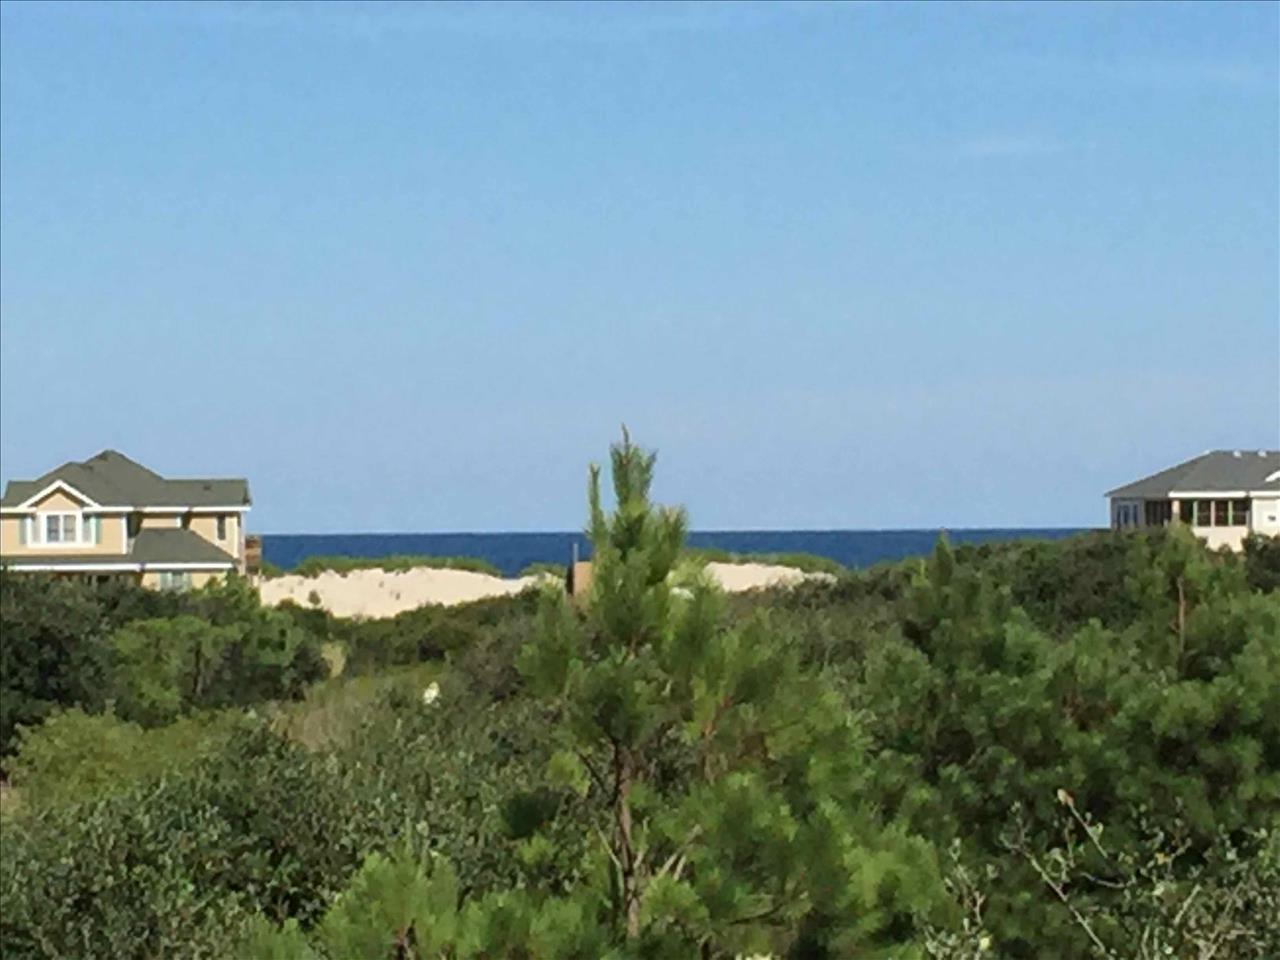 August 2015 Stay - OSN02 - Sea Breeze, Linda Haggerty